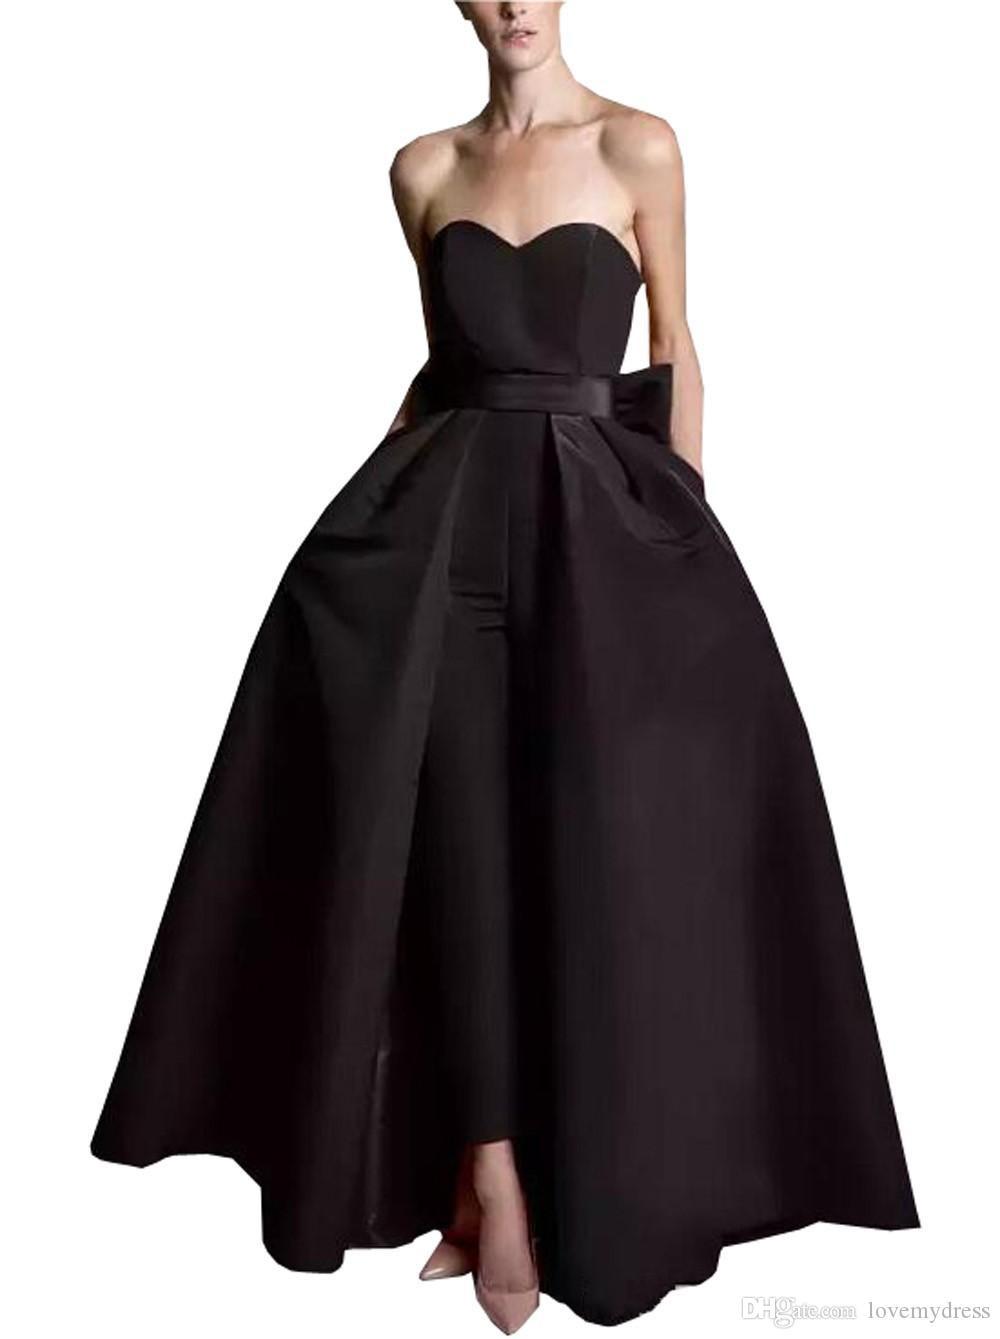 13 Top Satin Abendkleid Stylish15 Coolste Satin Abendkleid Boutique